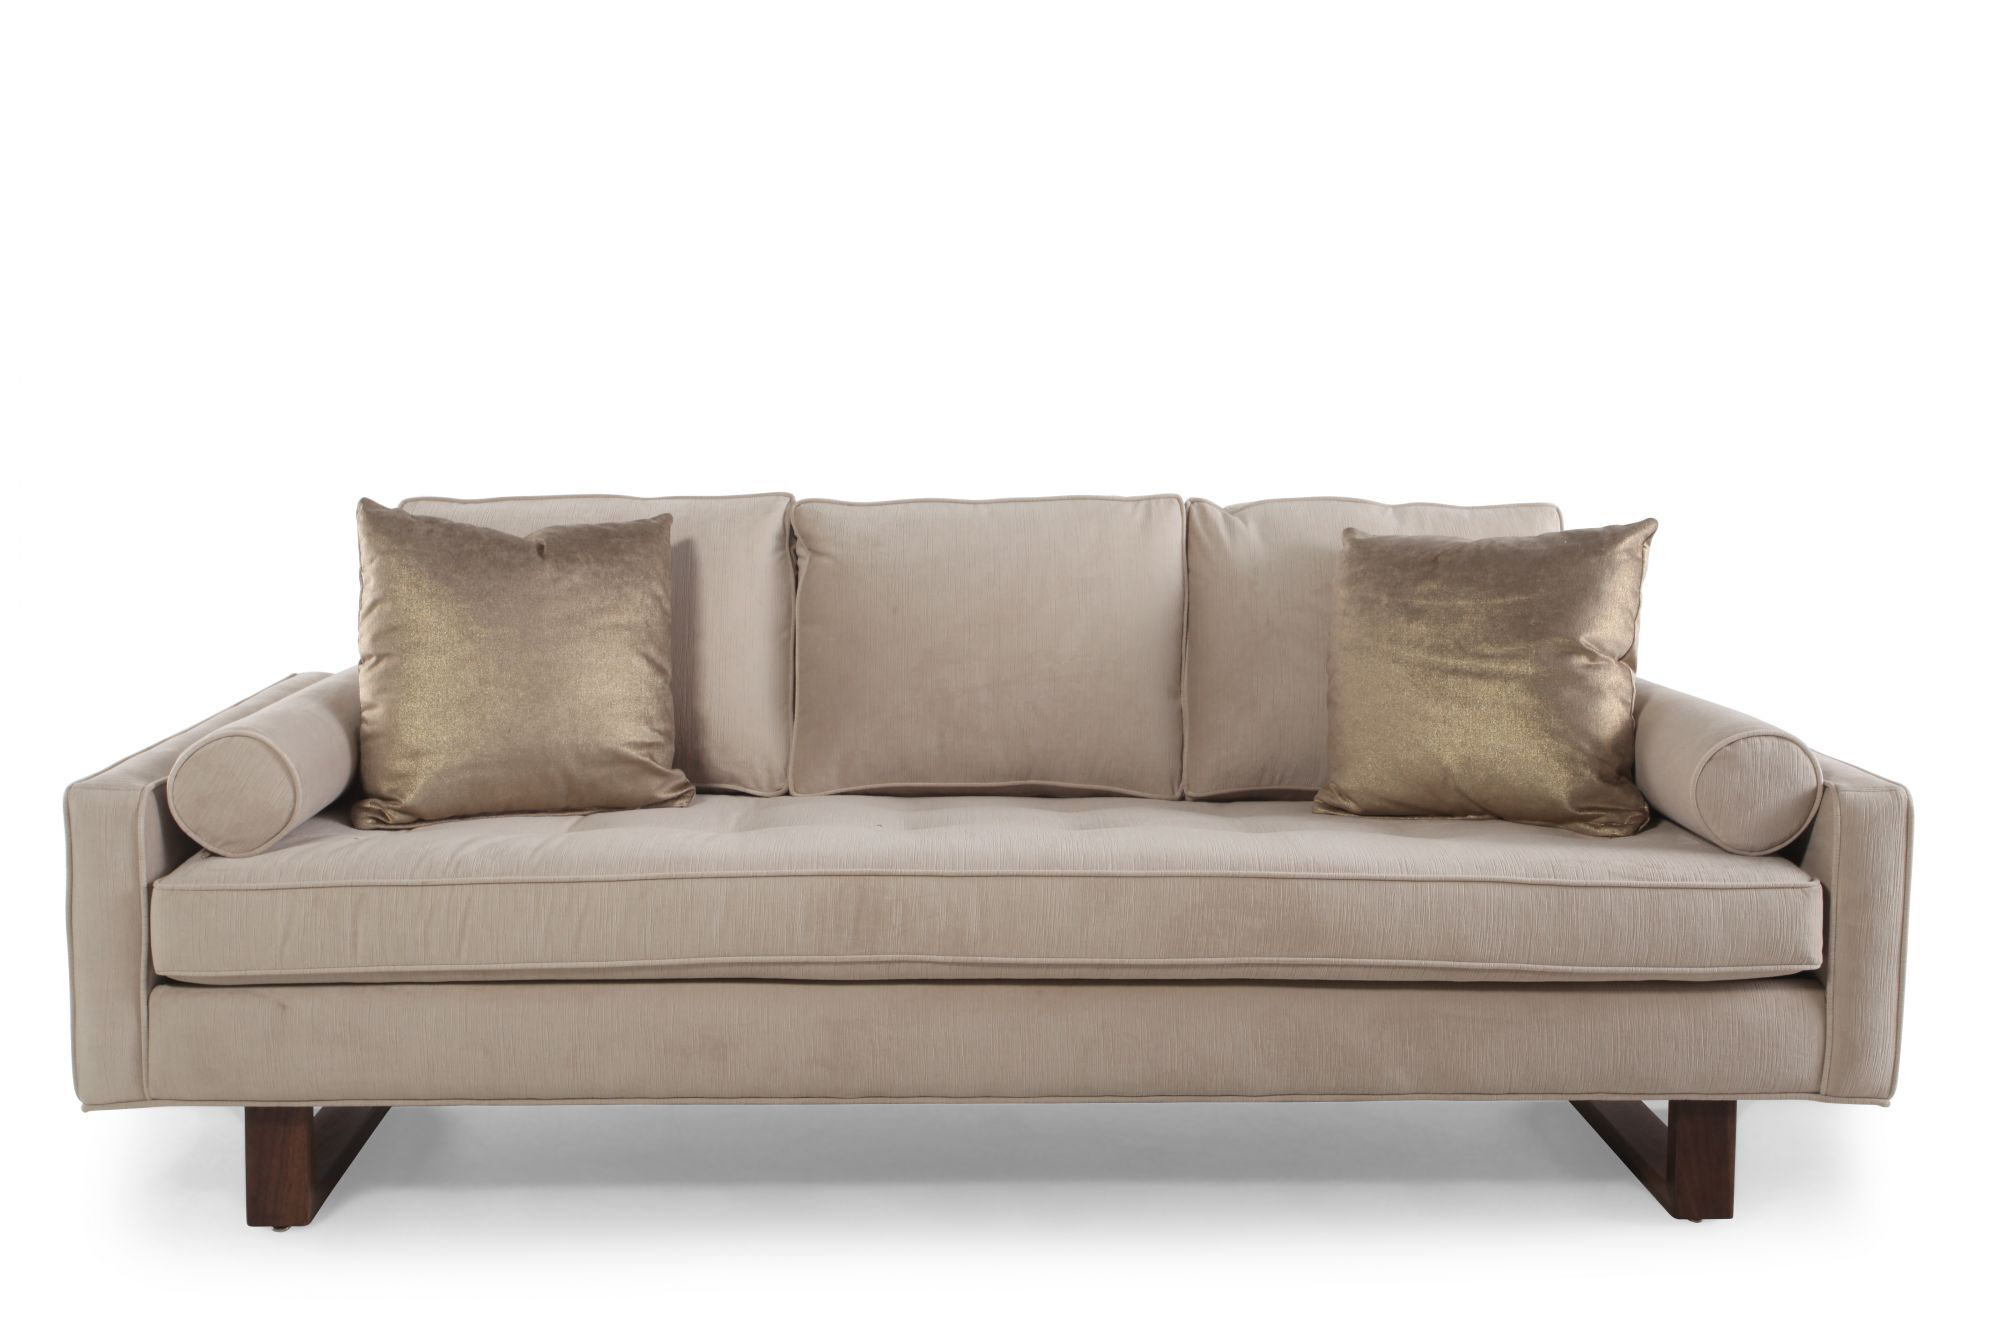 jonathan louis sofas baja convert a couch futon sofa sleeper bed claridge modern furniture